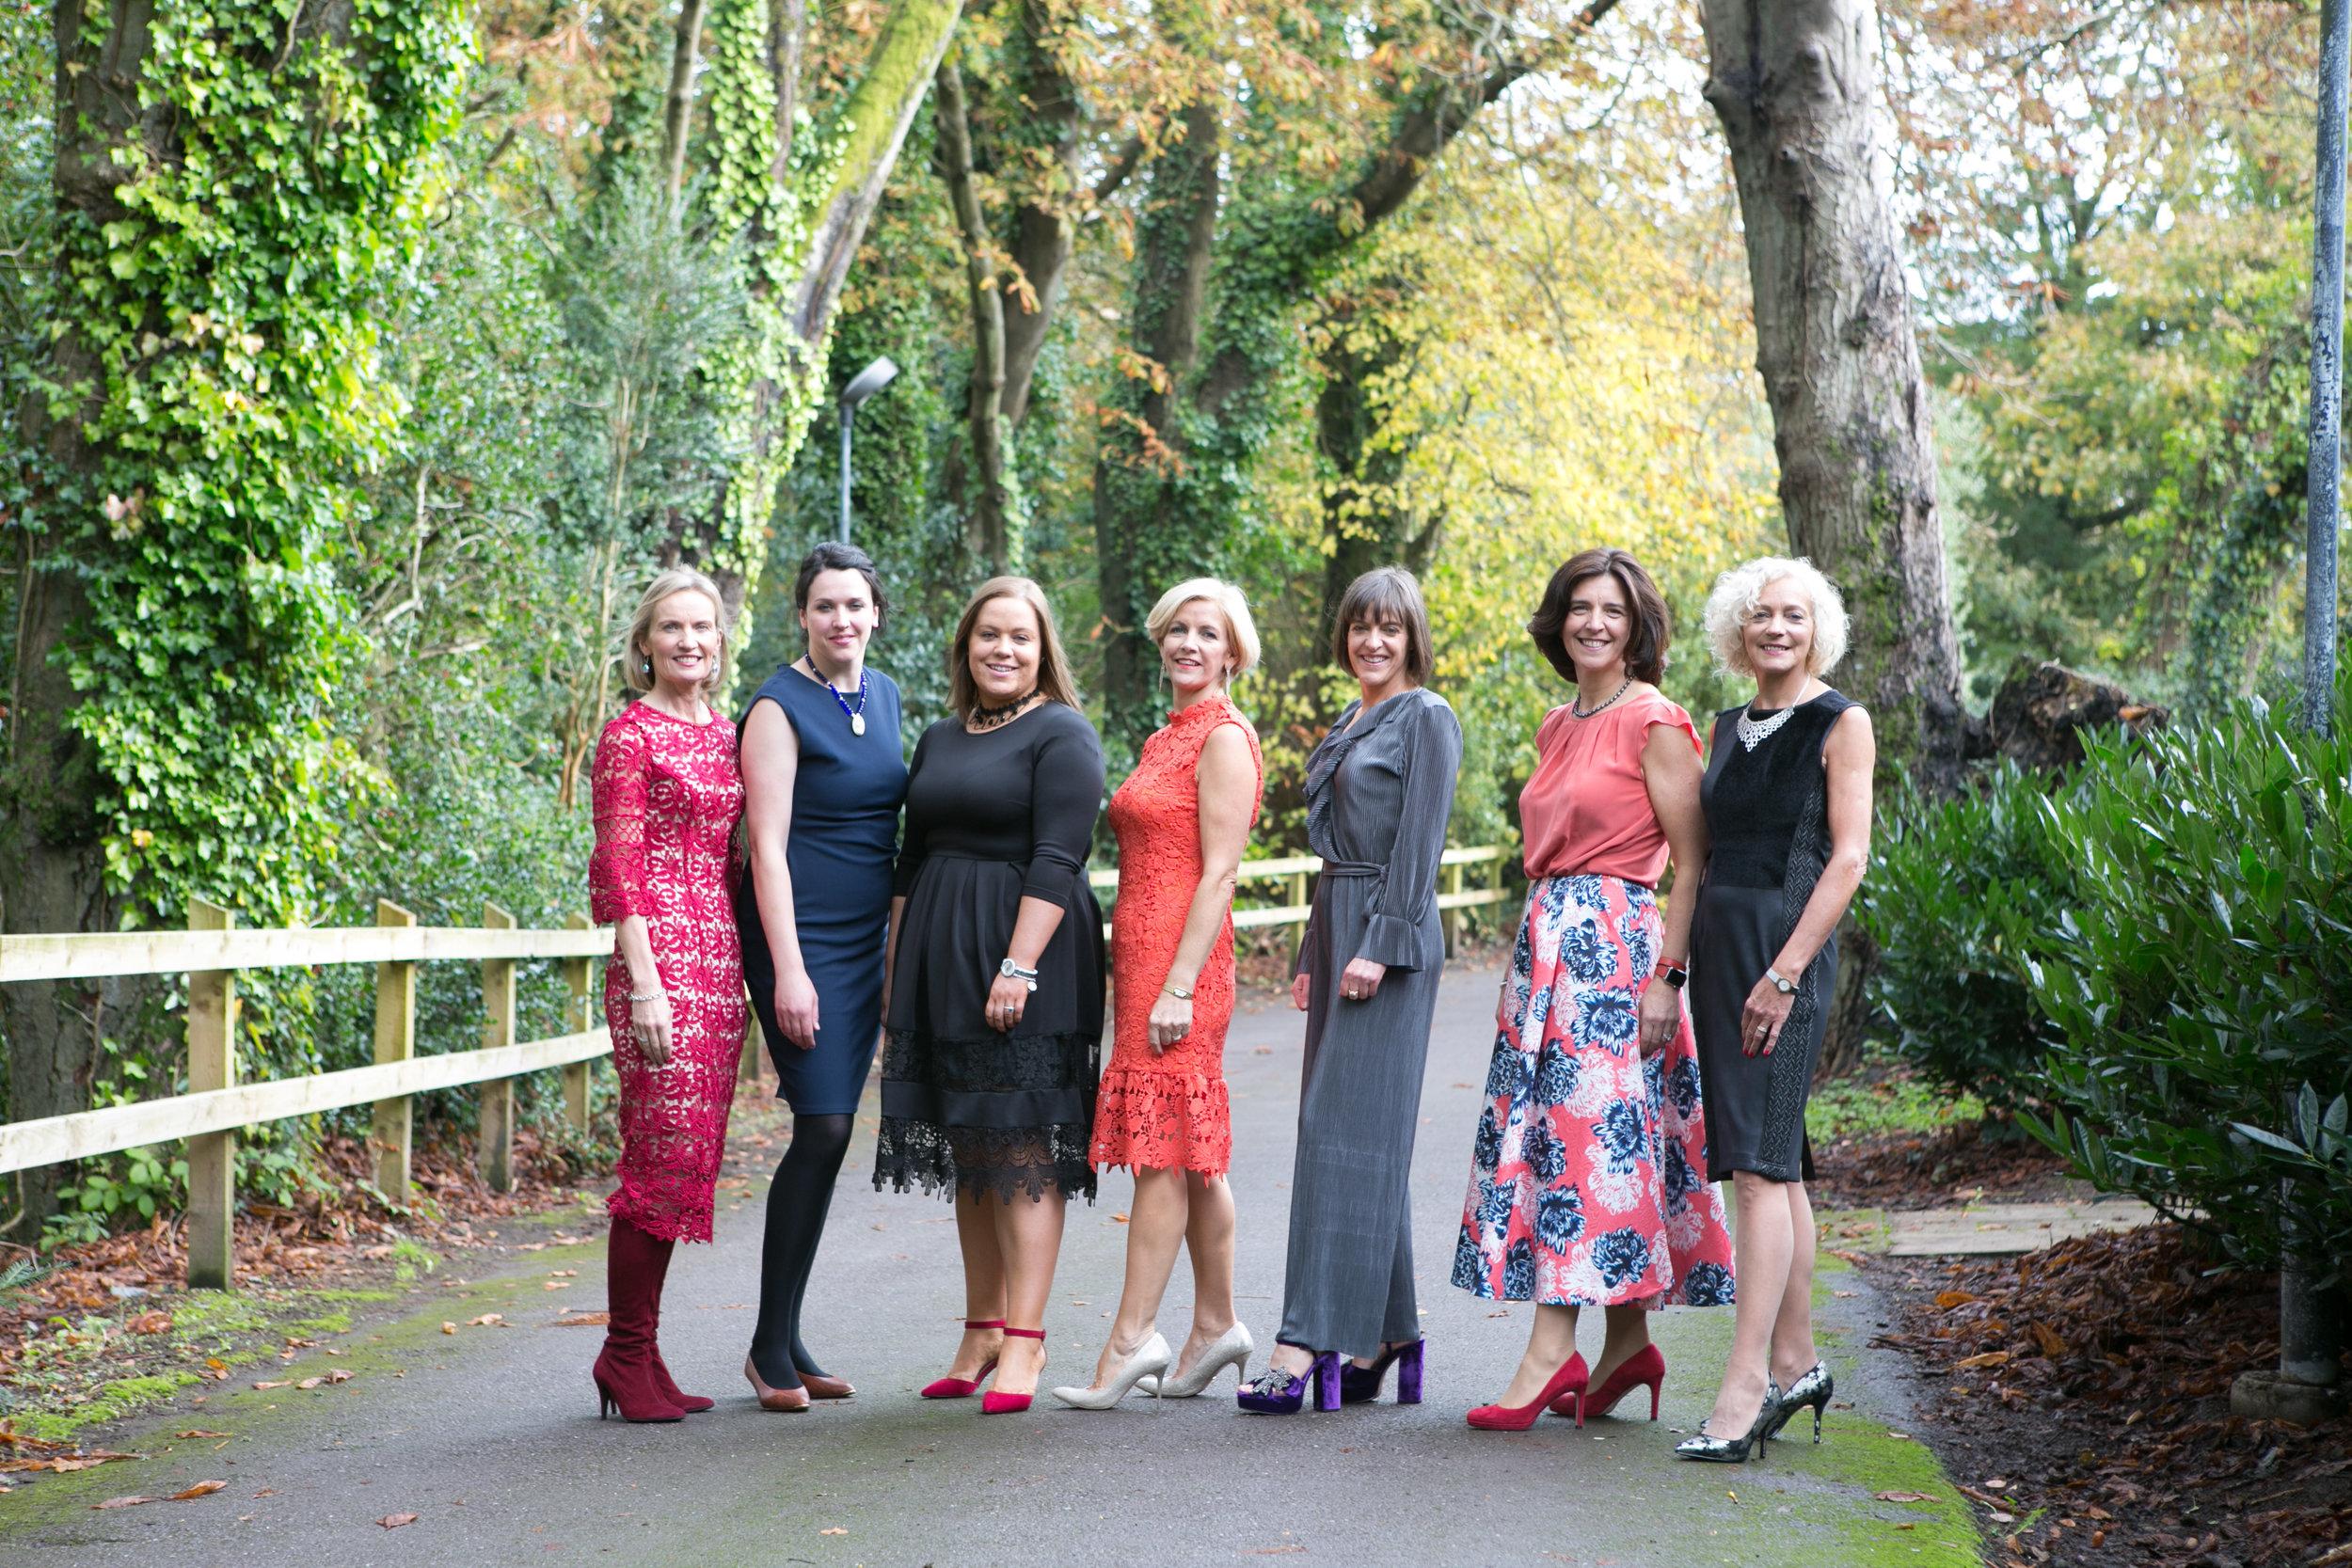 Organisers; Marguerite Guerin, Joanne McCarthy, Rachel Hill, Deirdre Whelan, Hilary Sullivan, Rachel Keating and Monica Barrett at the Annual Aer Lingus Autumn Lunch in aid of Cork ARC Cancer Support House.